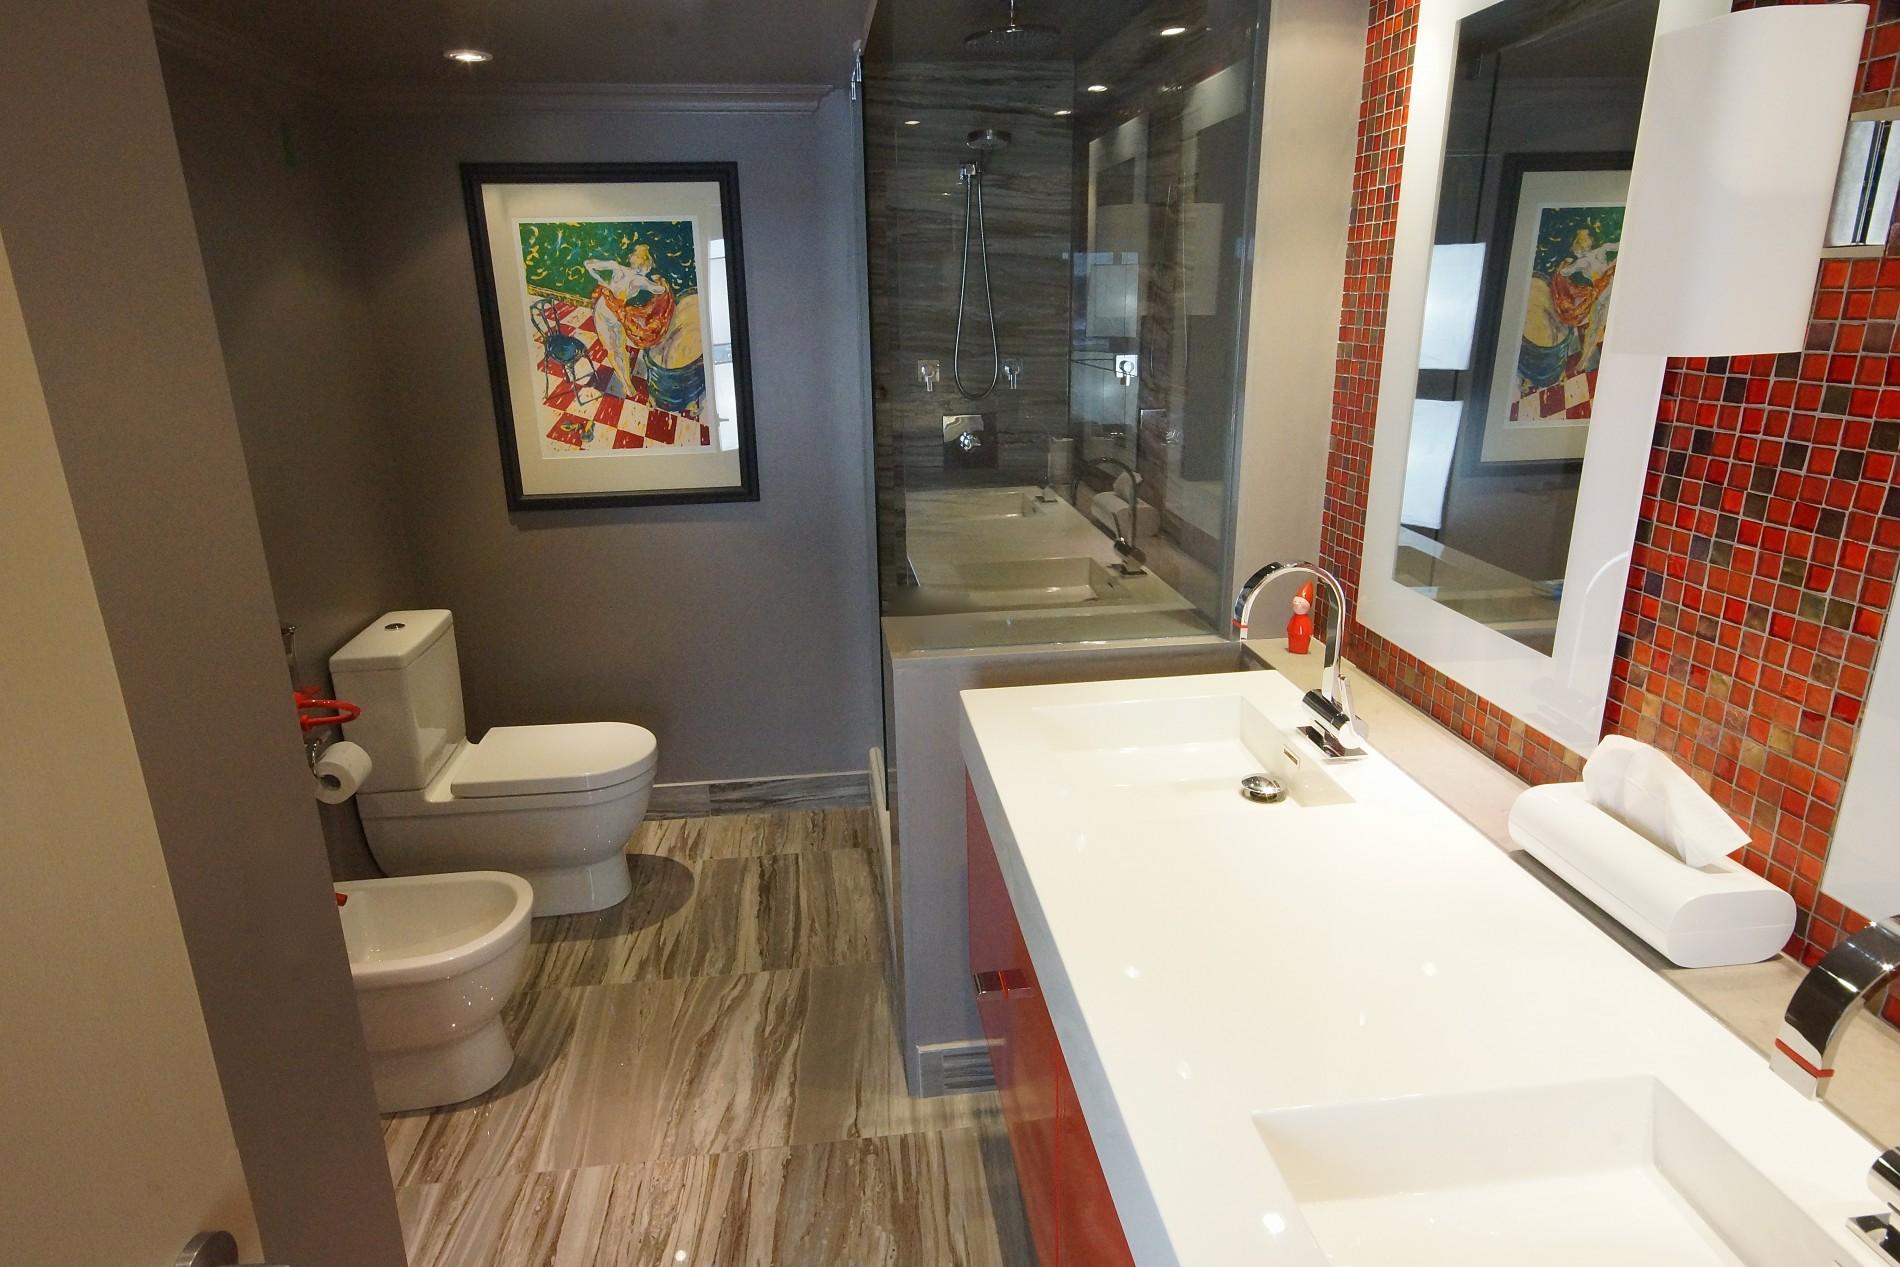 Toronto Lakeshore Transitional Bathroom - Featured Image